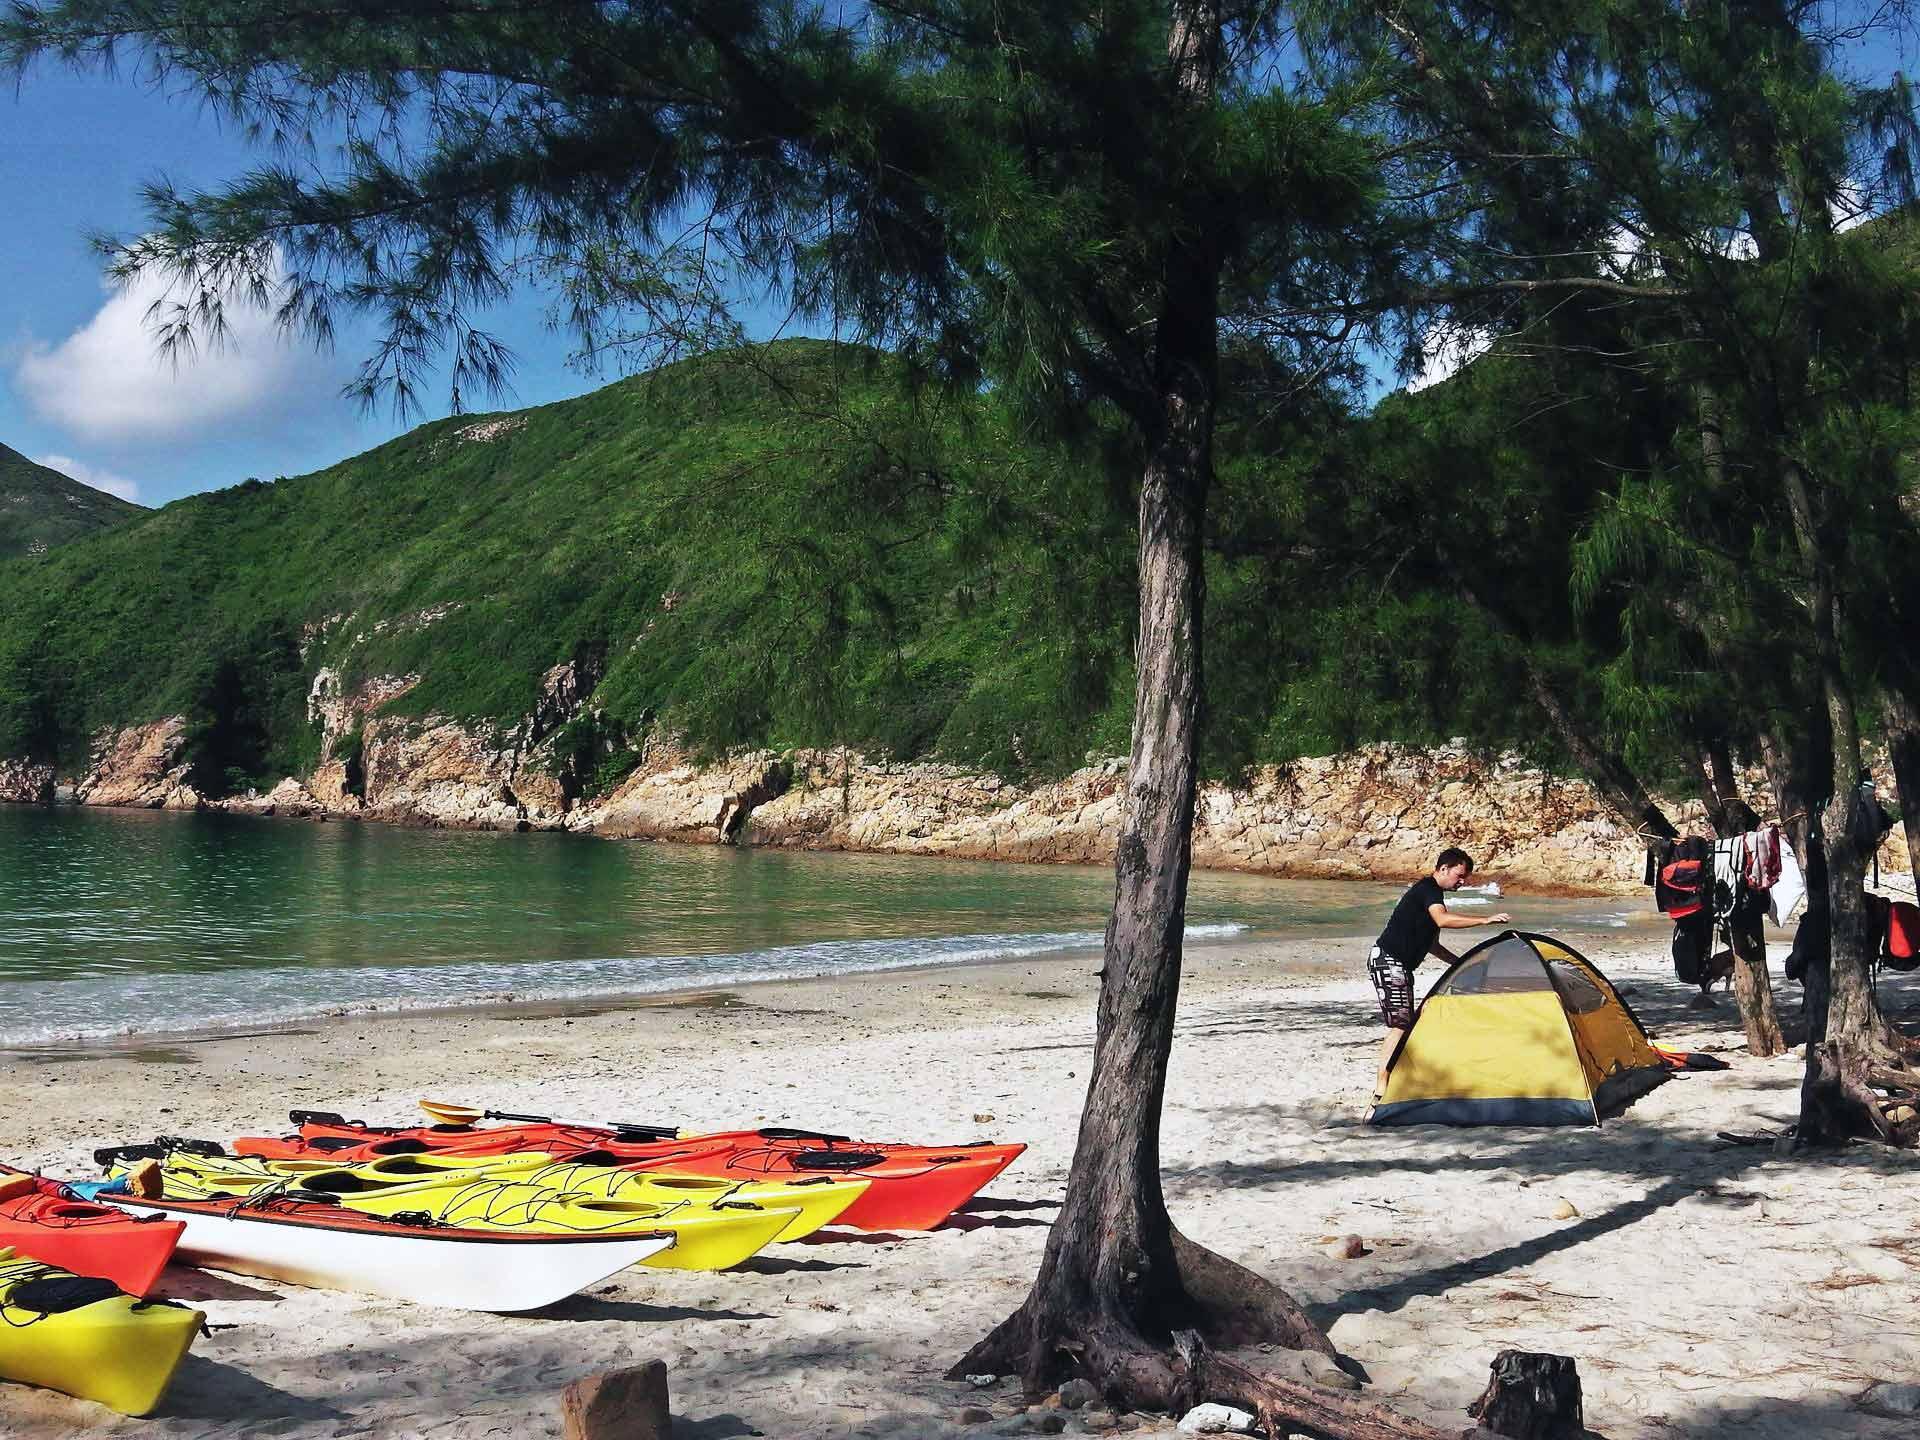 UNESCO Gloabal Geopark camping trip Hong Kong